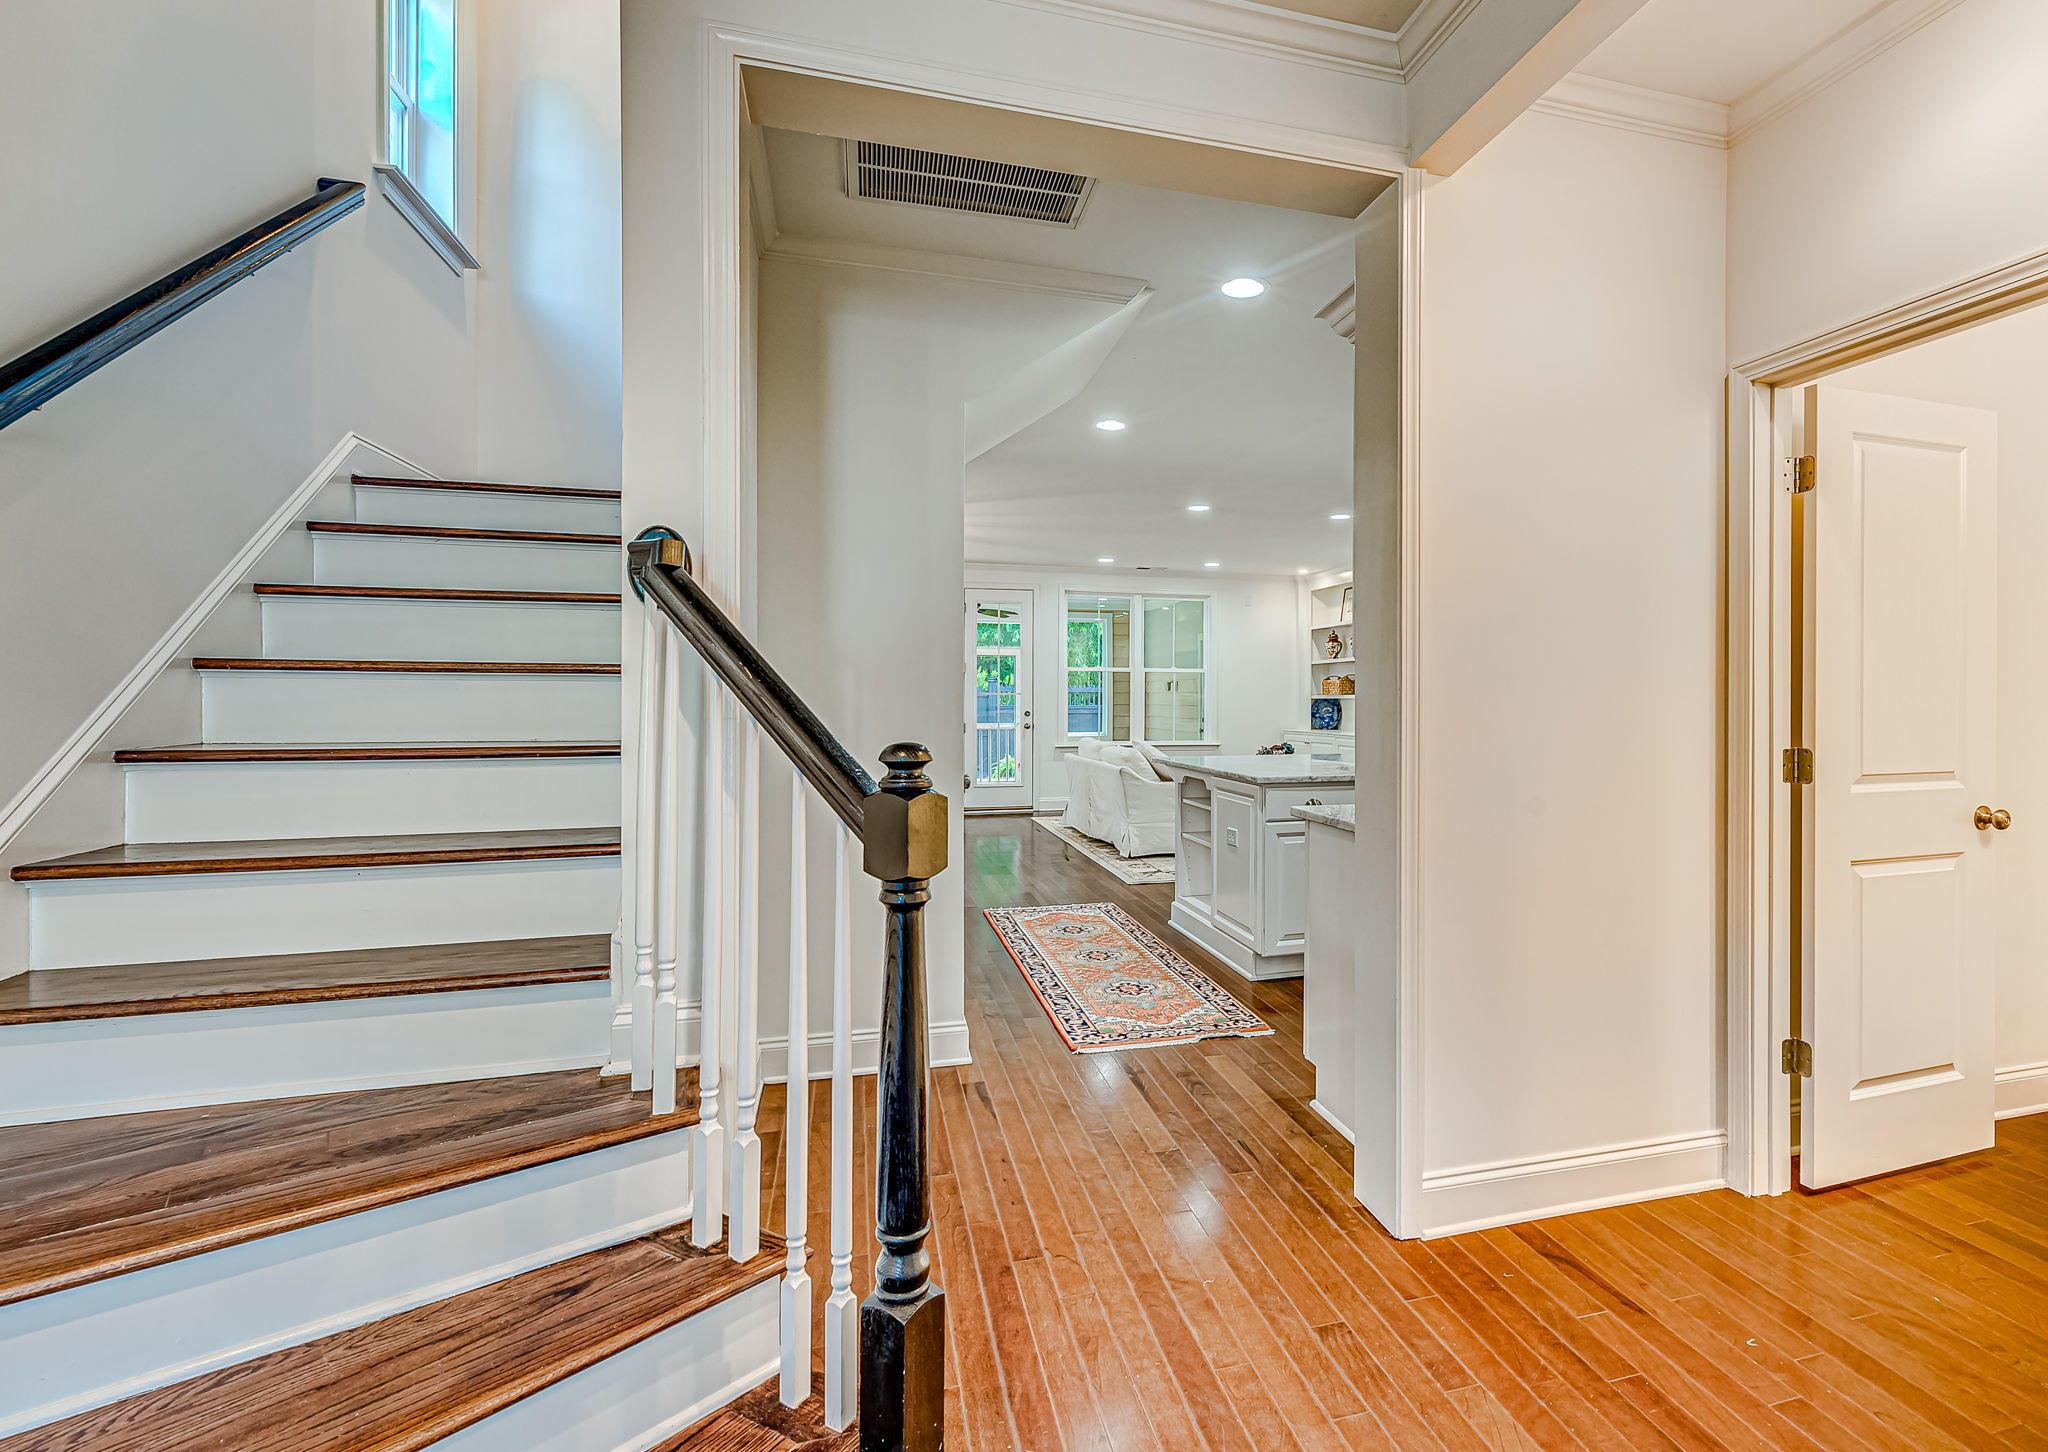 Dunes West Homes For Sale - 2476 Kings Gate, Mount Pleasant, SC - 51